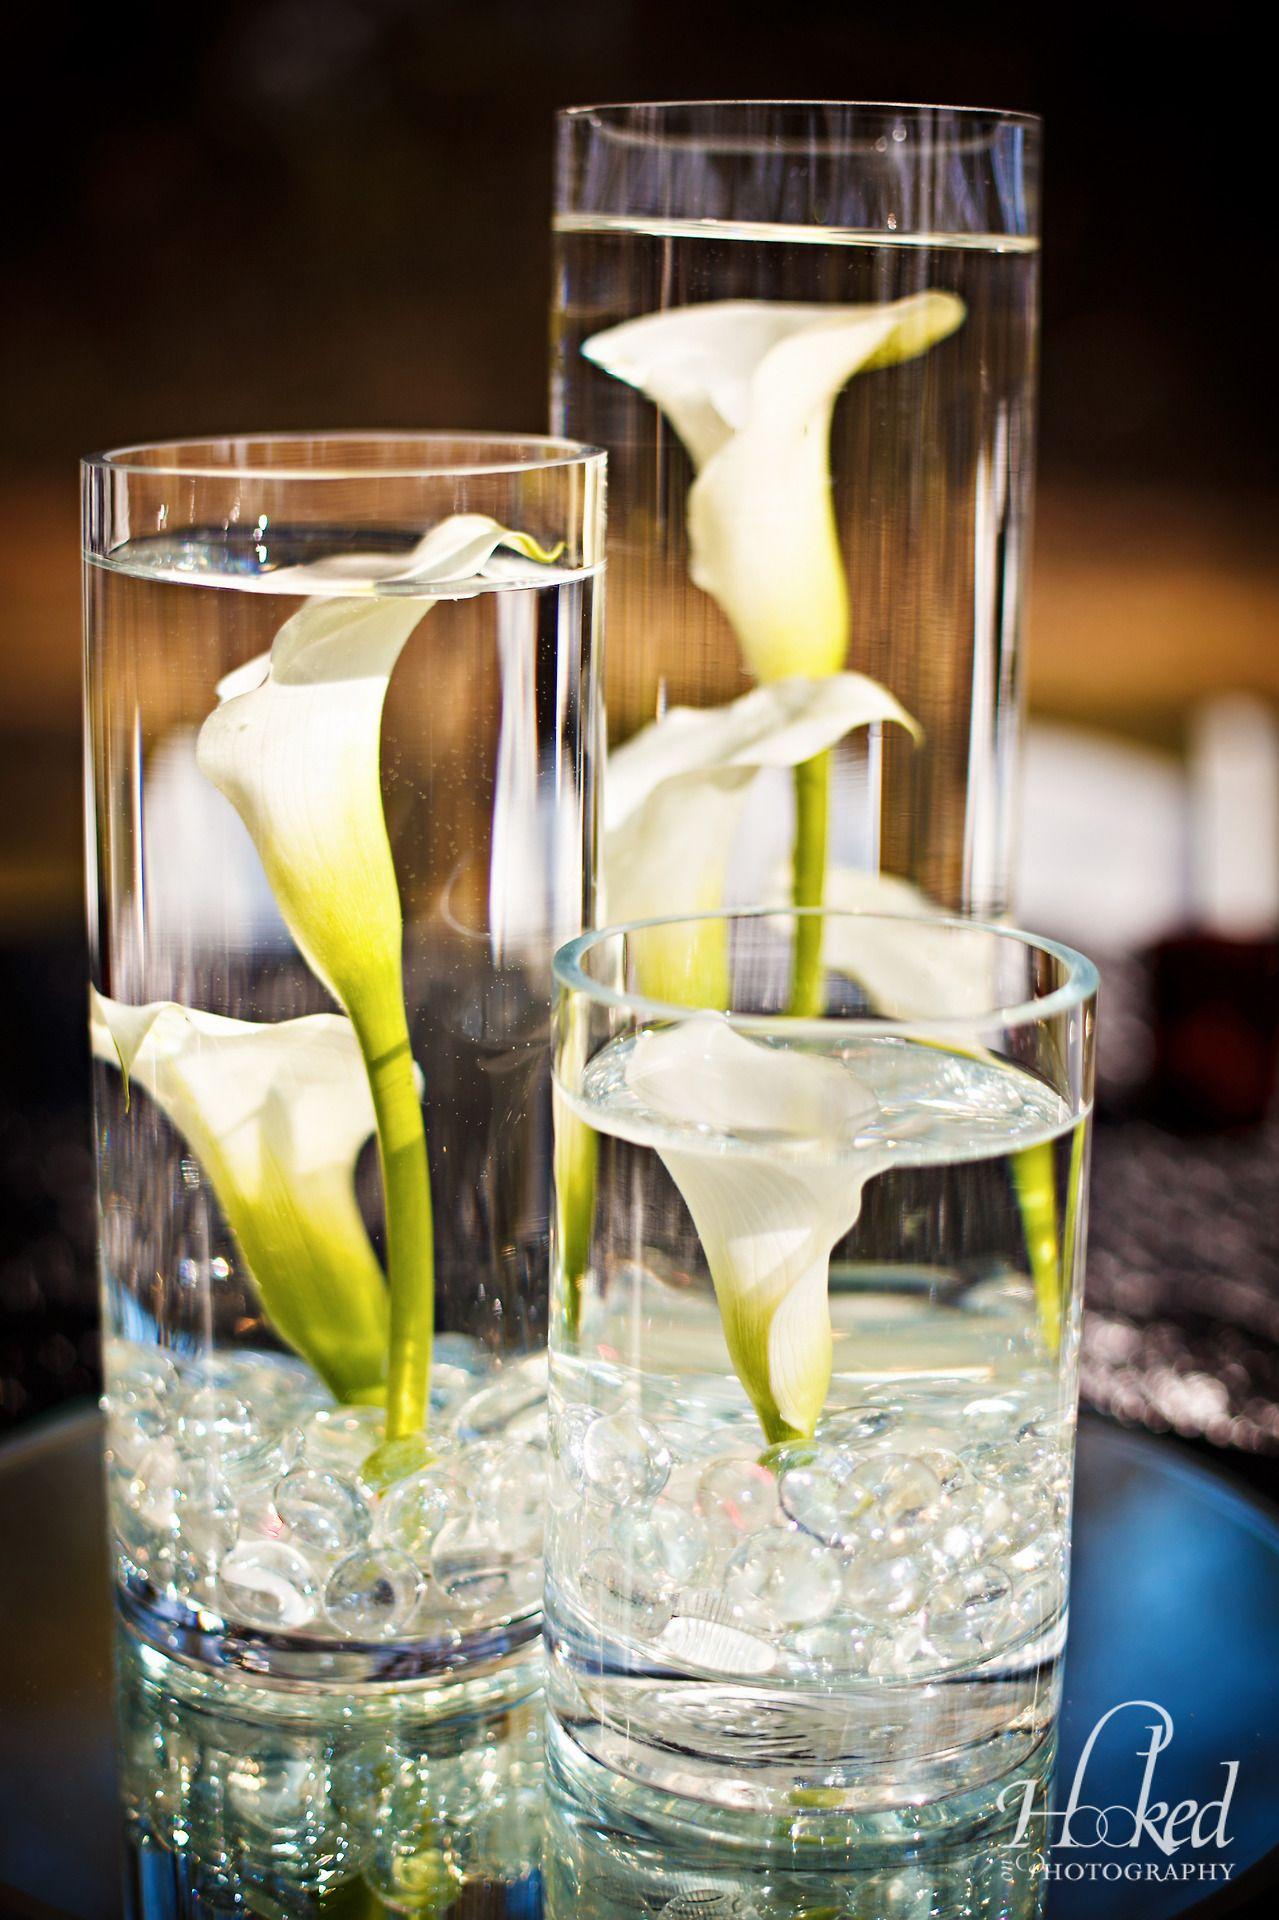 White submerged calla lilies at wedding reception. Calla